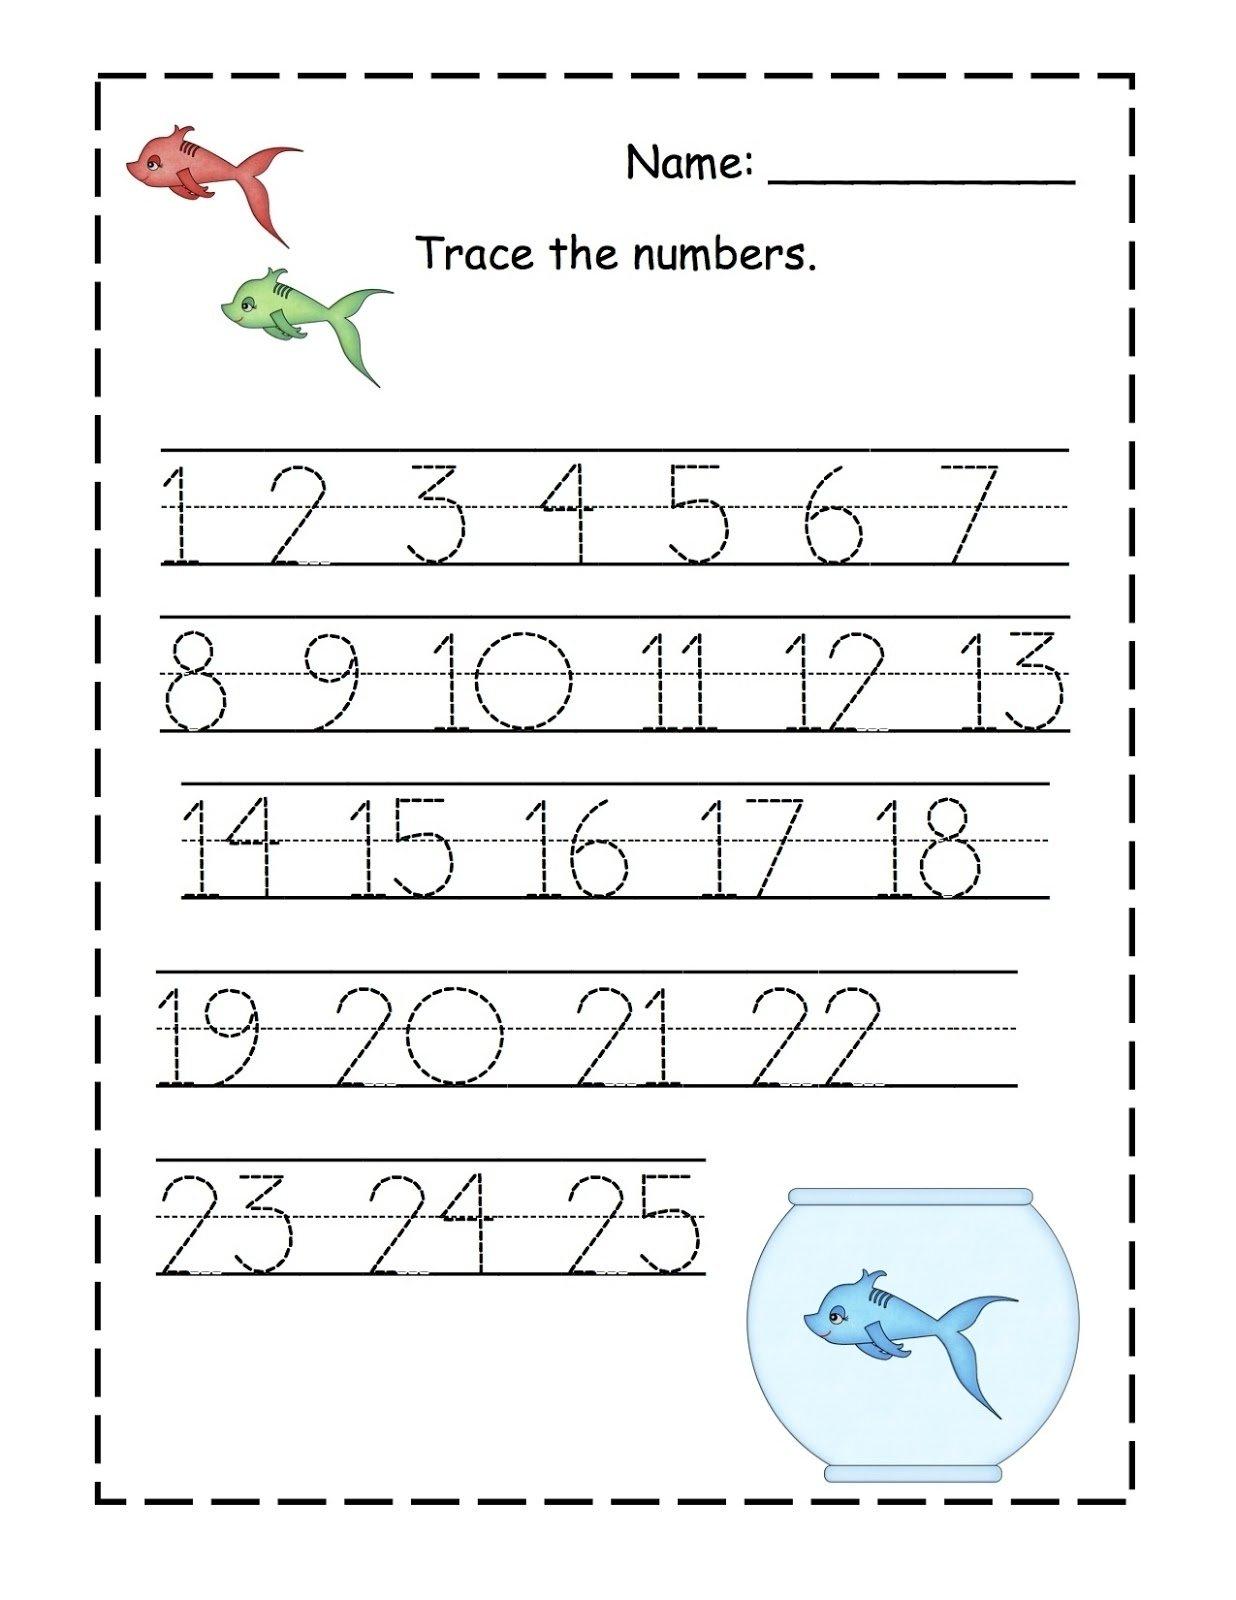 Printable Numbers Up To 31 | Ten Free Printable Calendar Printable Calendar Numbers 1-31 May